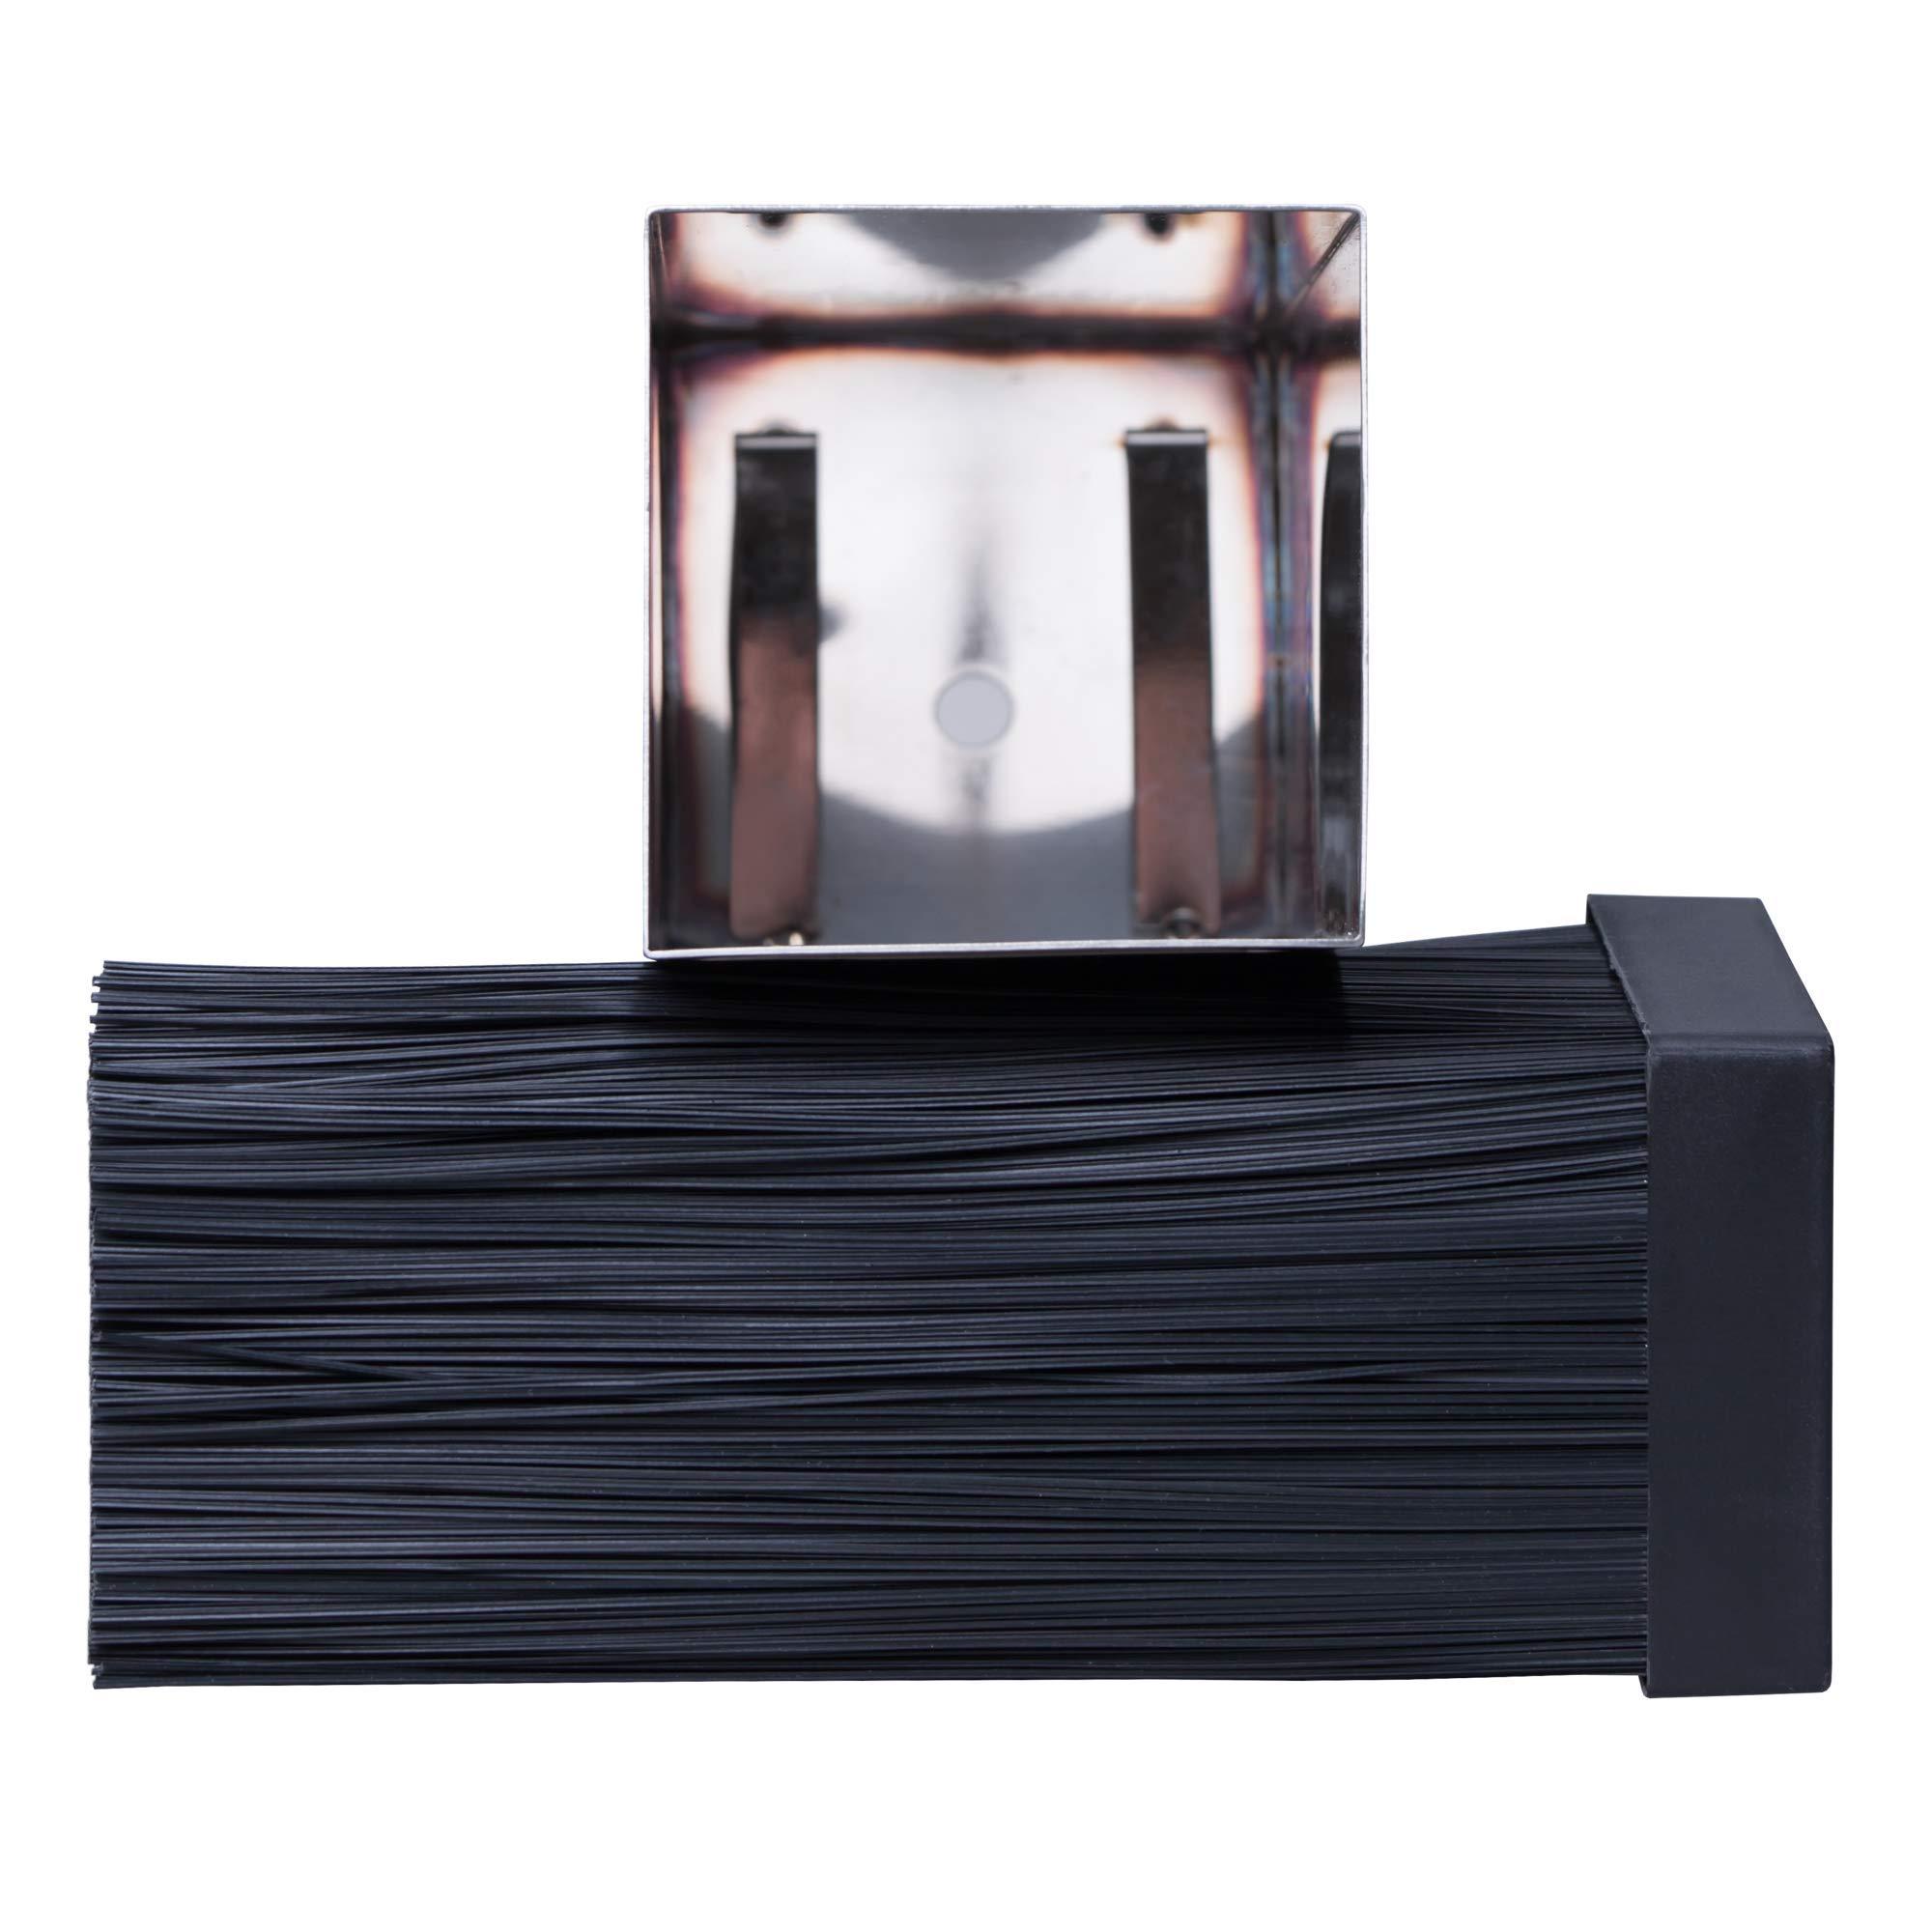 Universal Stainless Steel Knife Block Organizer – For Safe Kitchen Knife Holder Easy Clean Dishwasher Safe – Space Saver Knife Storage Stand by Leeffood (Image #8)